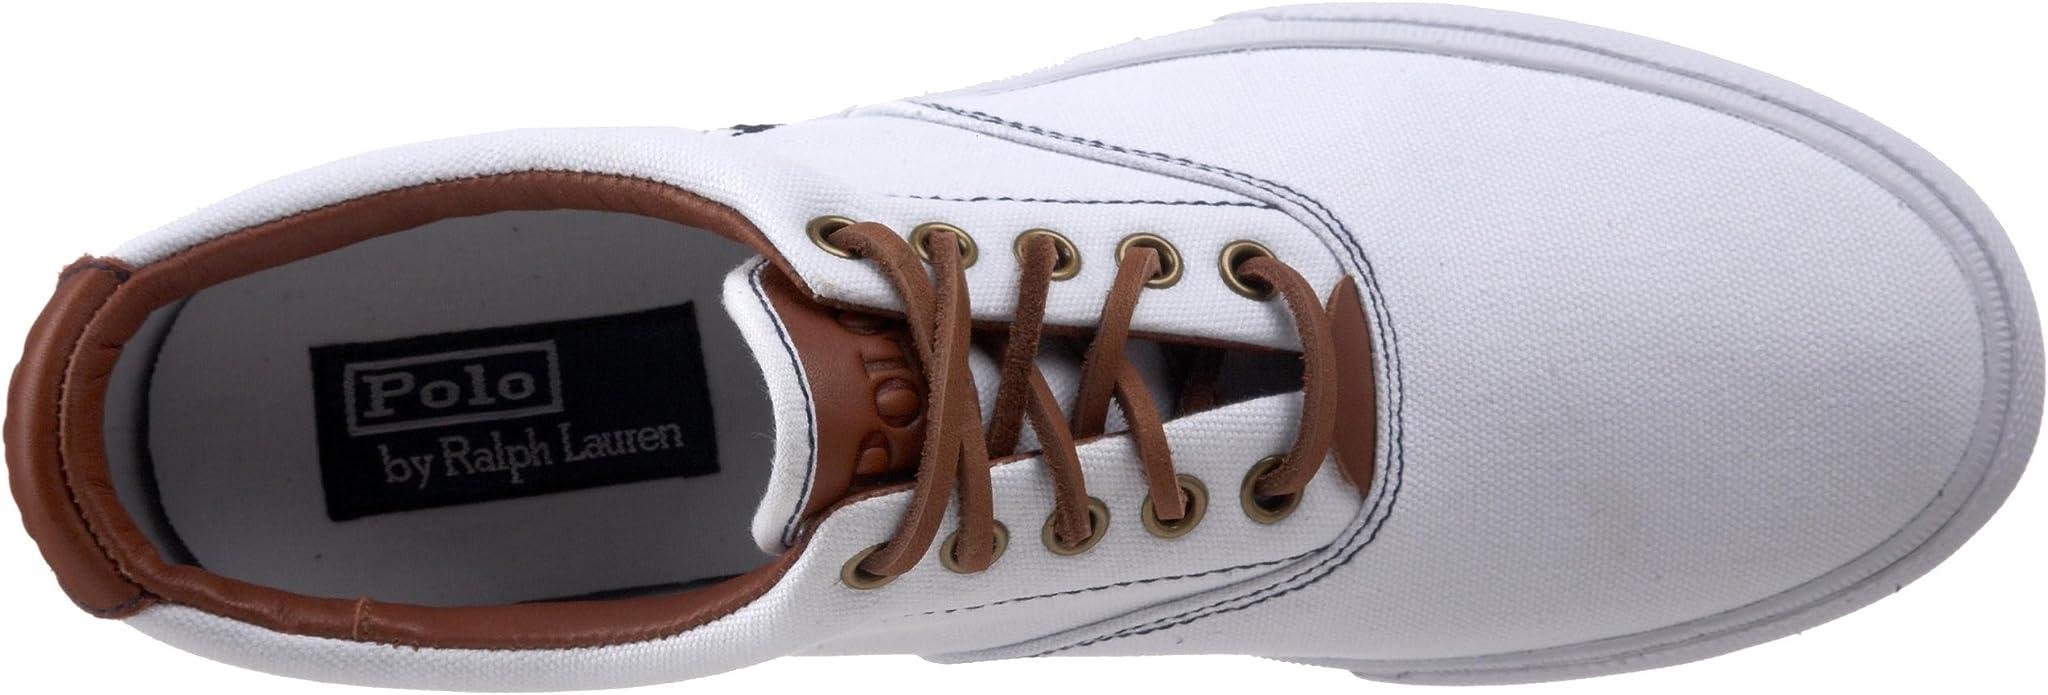 Ralph Lauren Vaughn White Mens Trainers Size 41 EU: Amazon.es ...